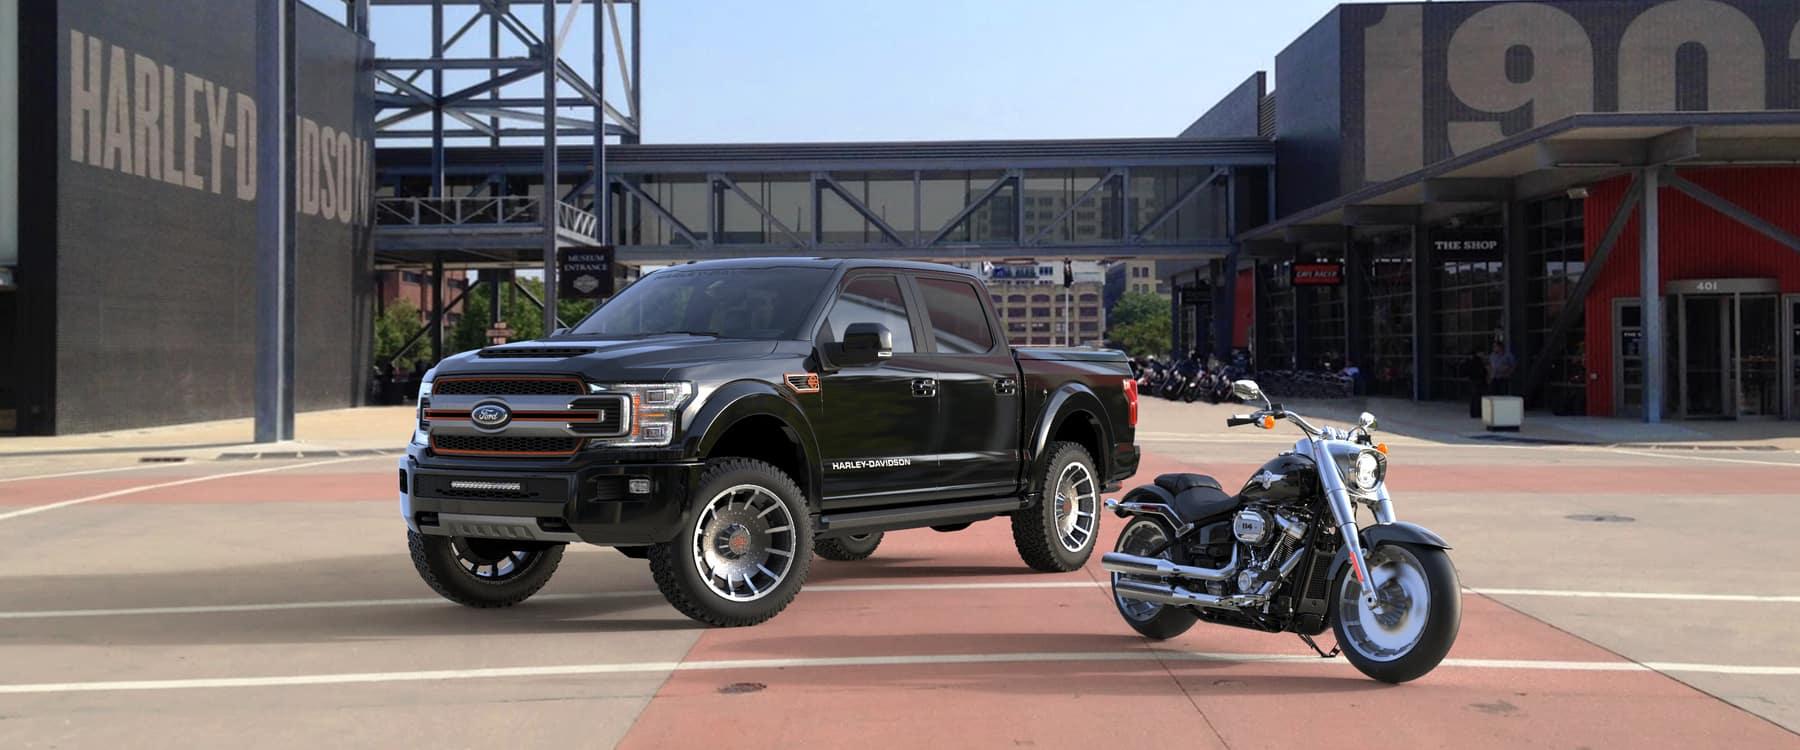 Harley-Davidson-F-150